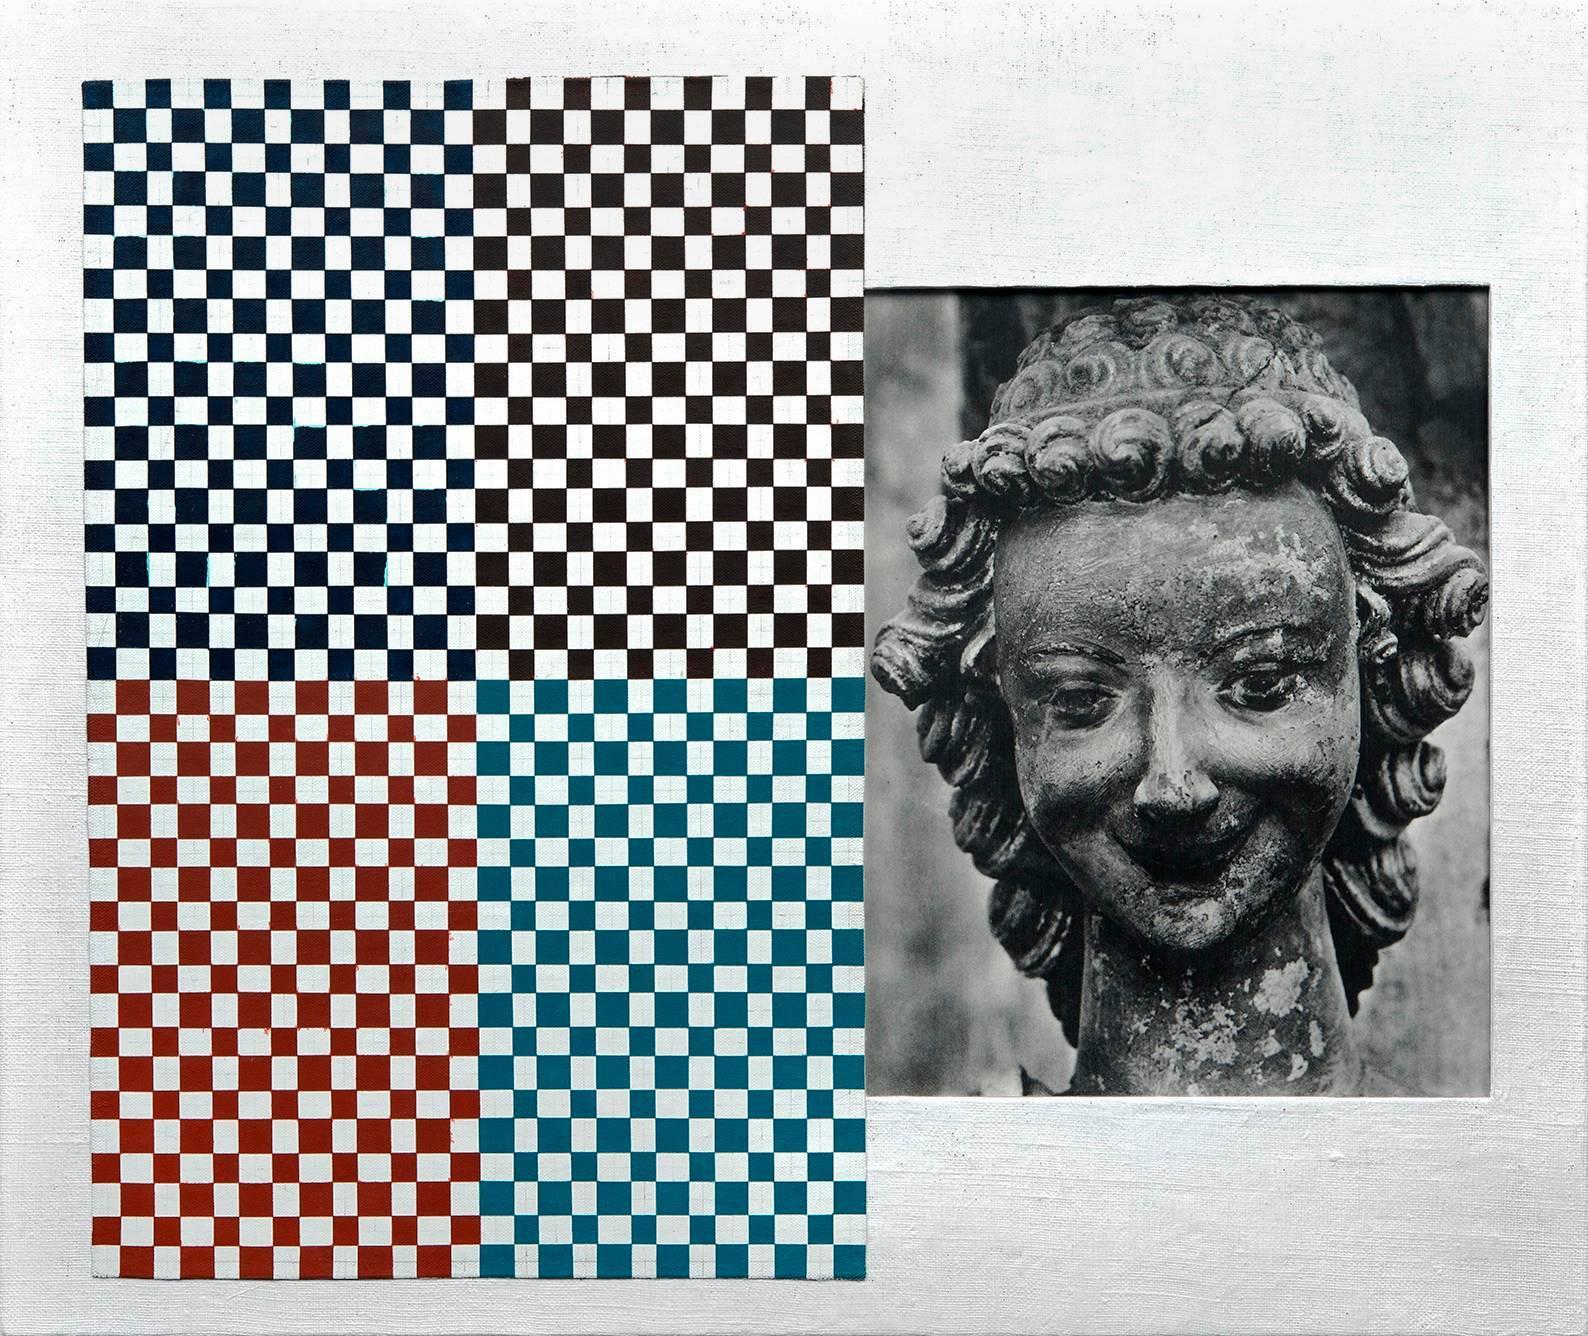 Ken Weathersby, 248, 2015, Linen, Acrylic Paint, Graphite